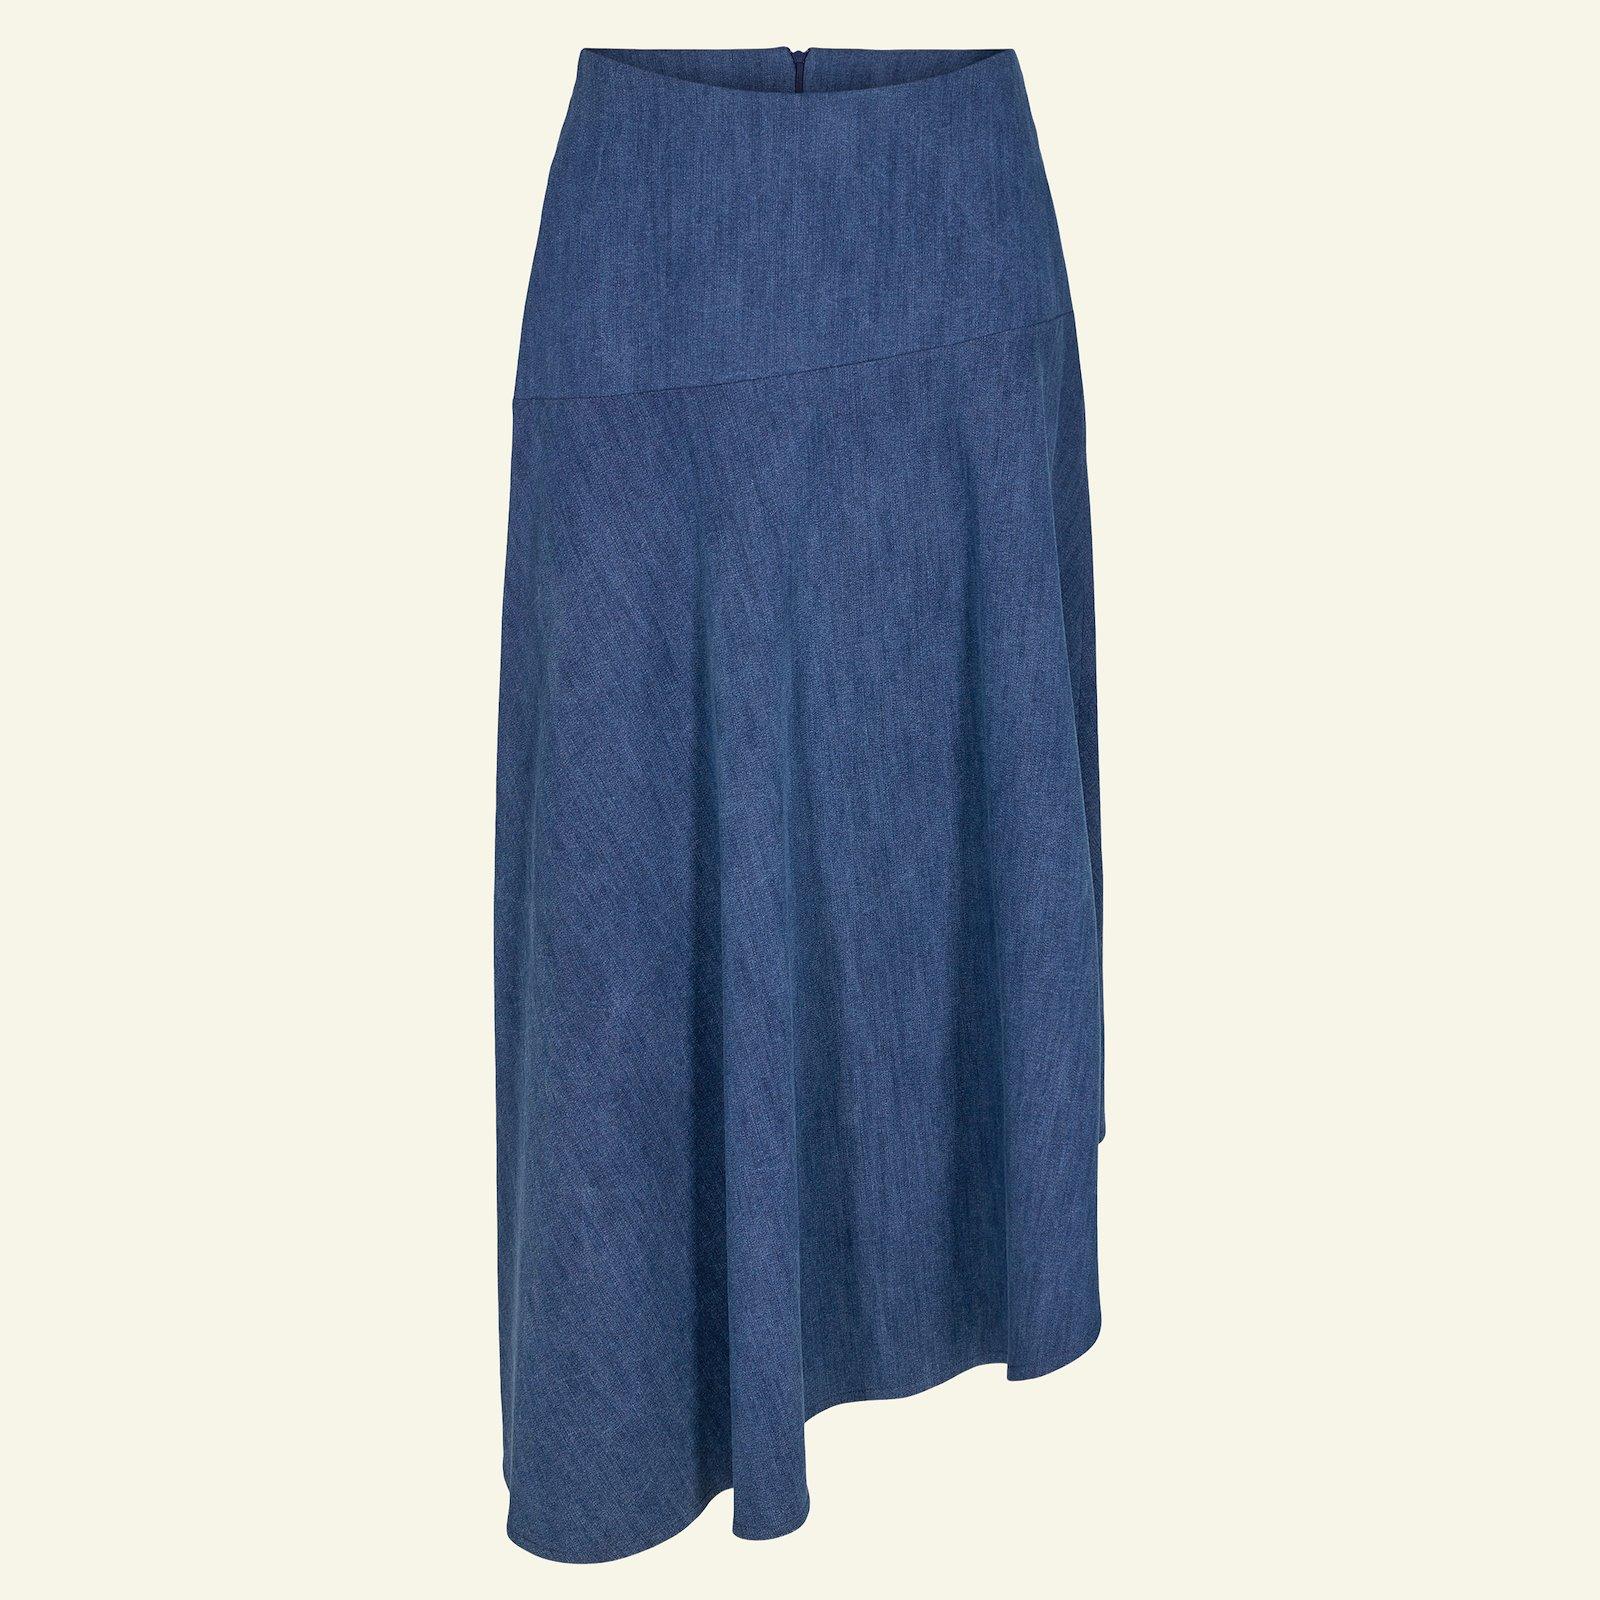 Asymmetric skirt, 40/12 p21041_460851_sskit